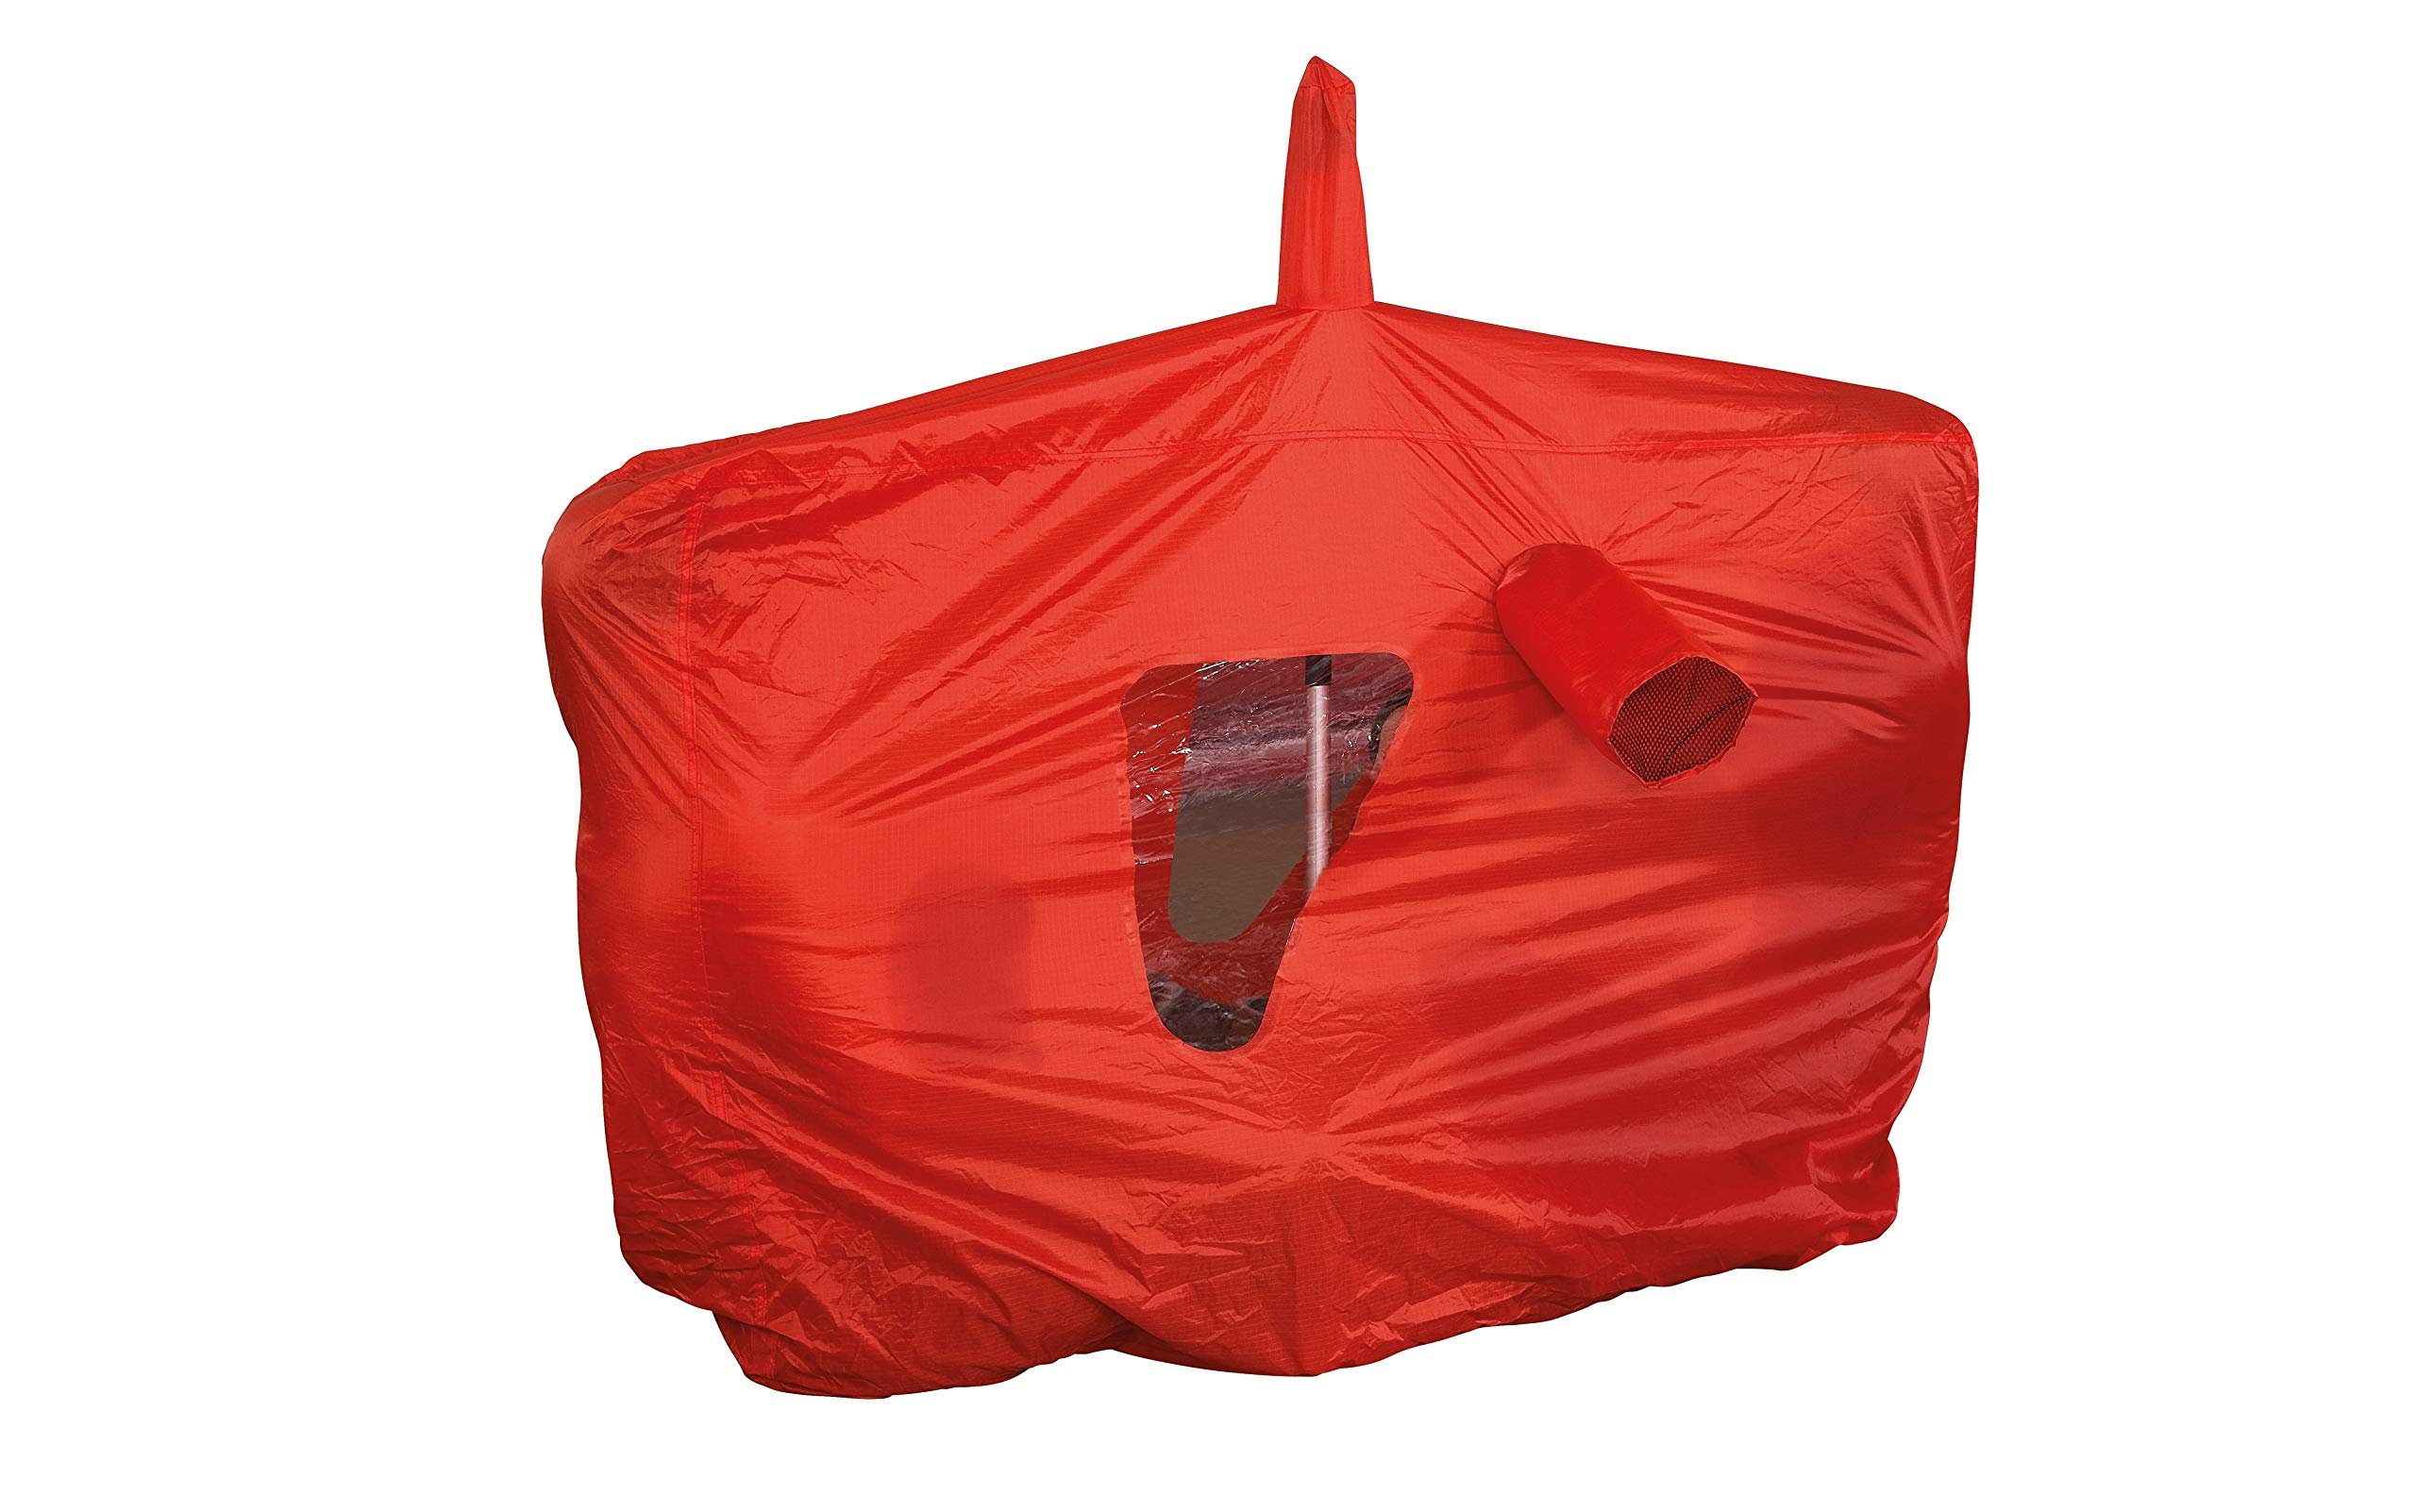 Terra Nova Equipment Bothy Bag 2 by Terra Nova